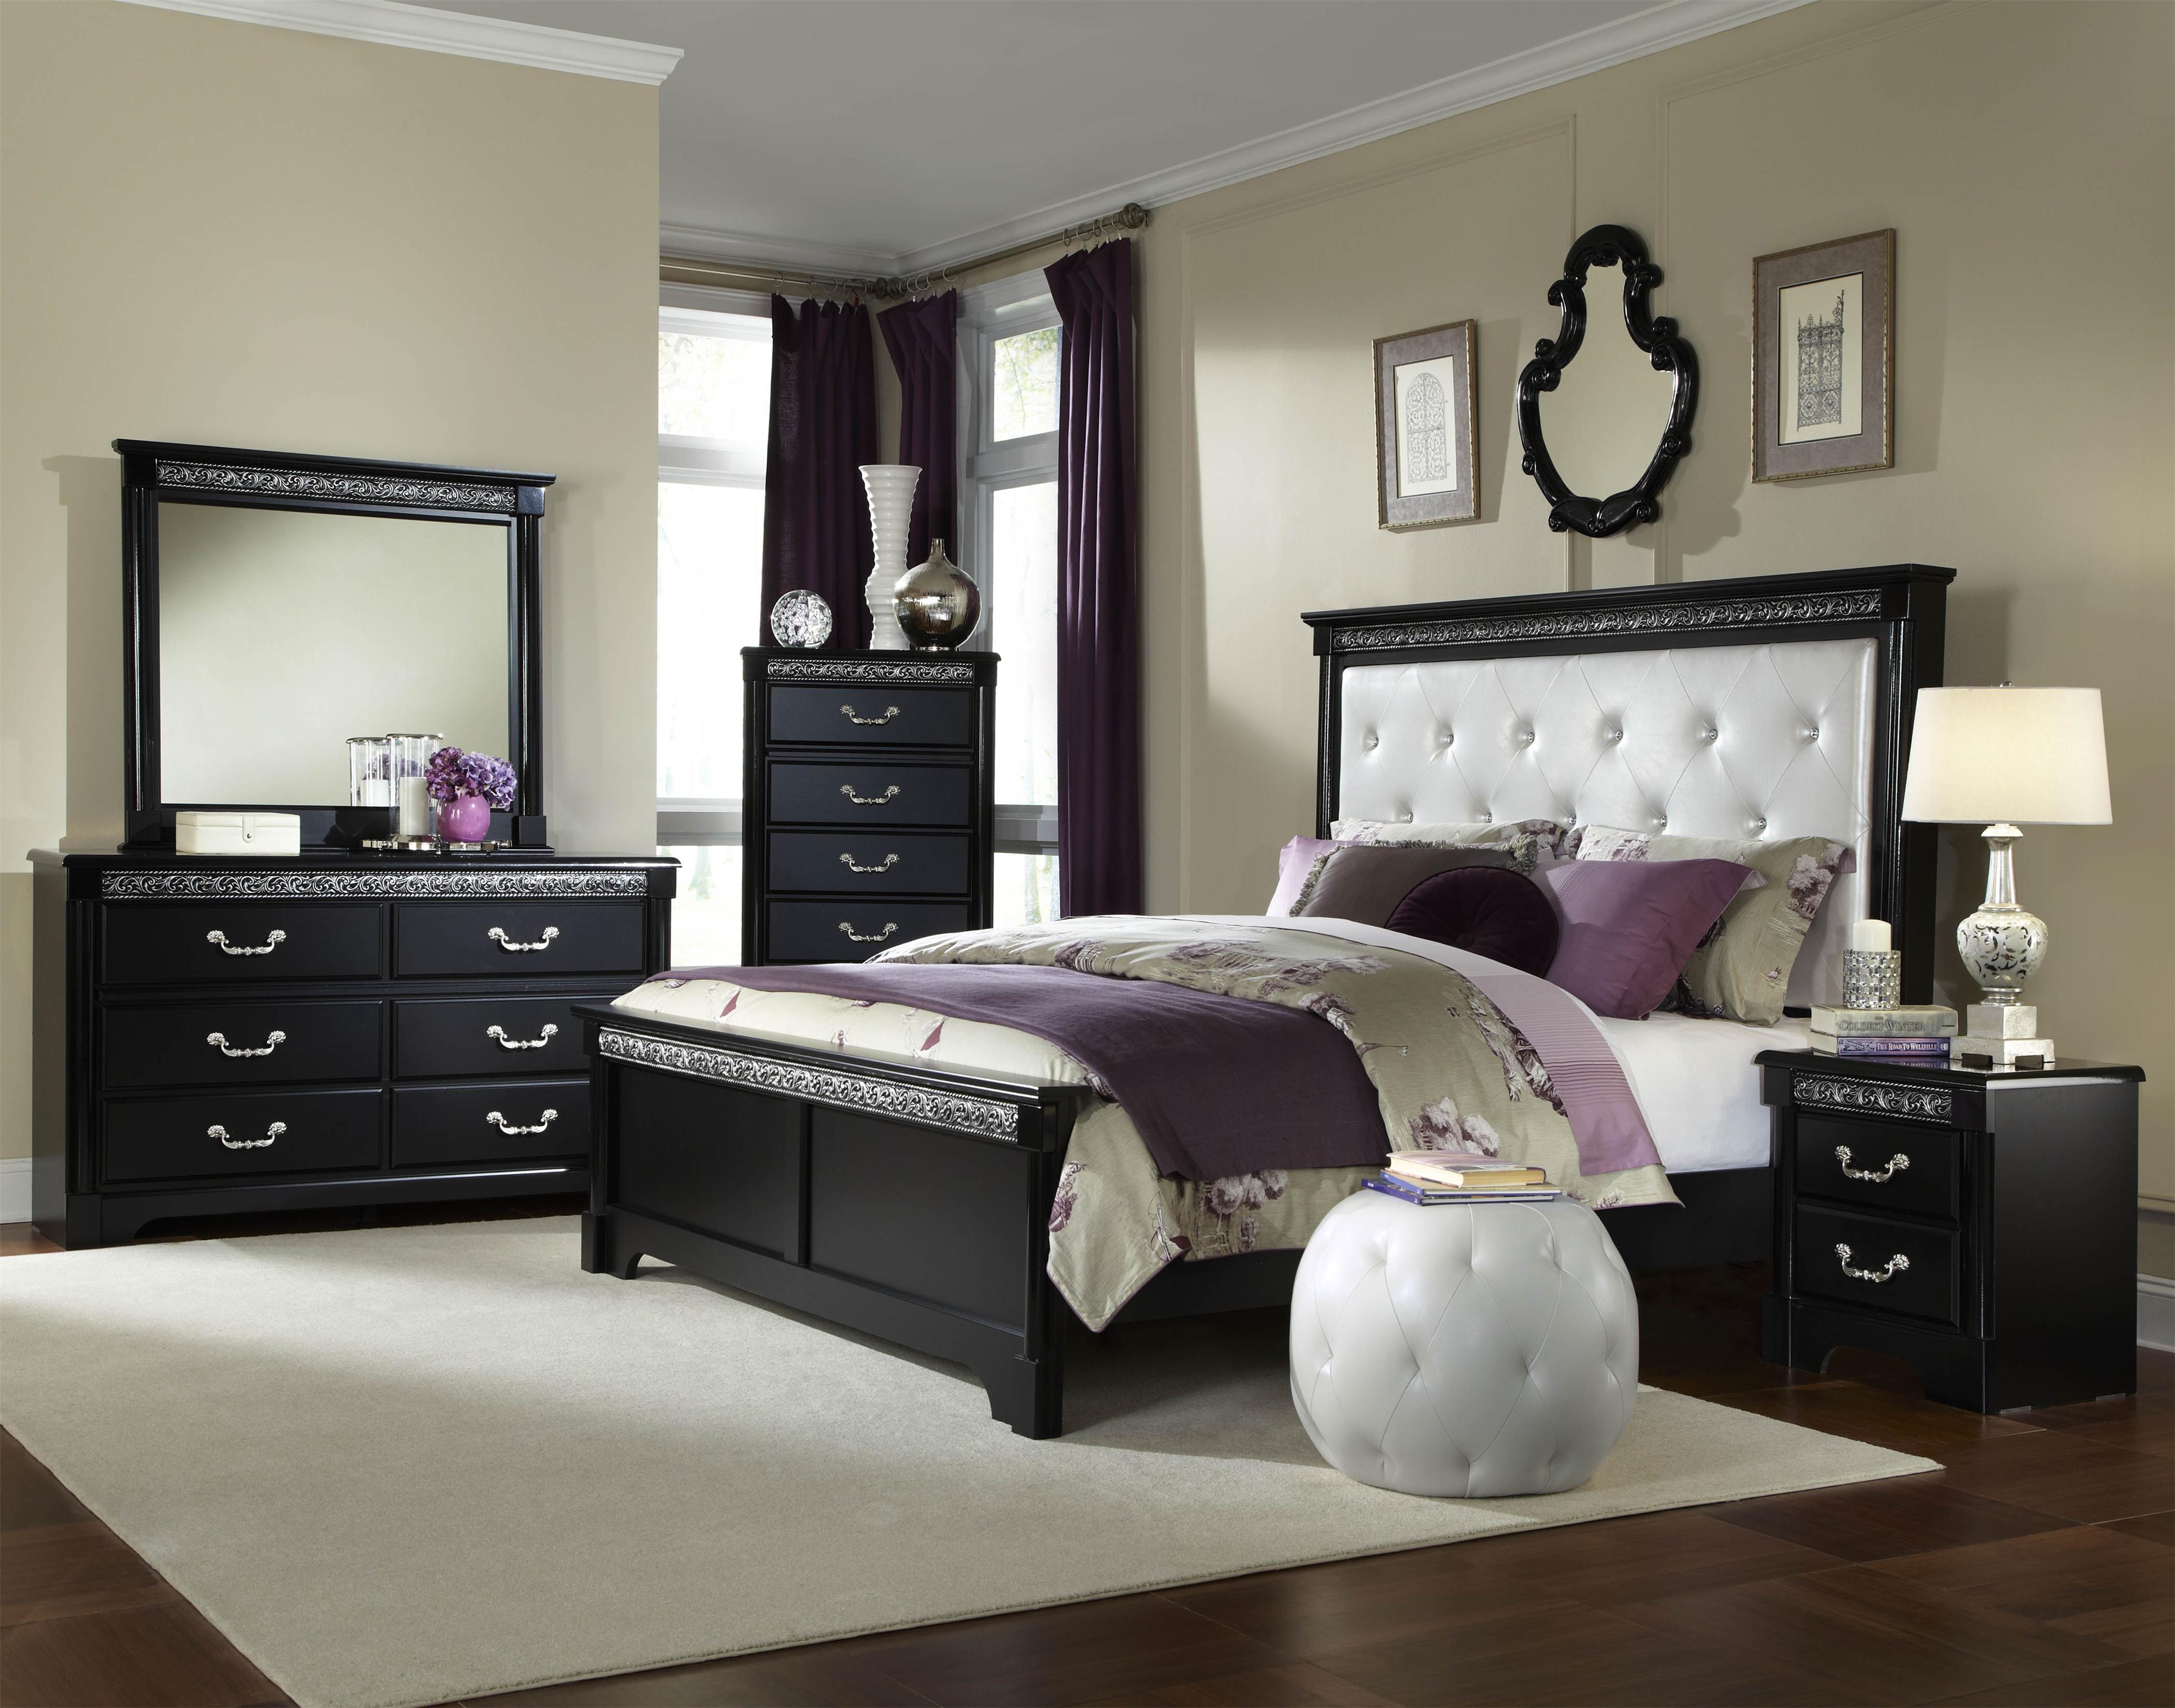 Standard Furniture Venetian King Bedroom Group - Item Number: 69250 King Bedroom Group 1